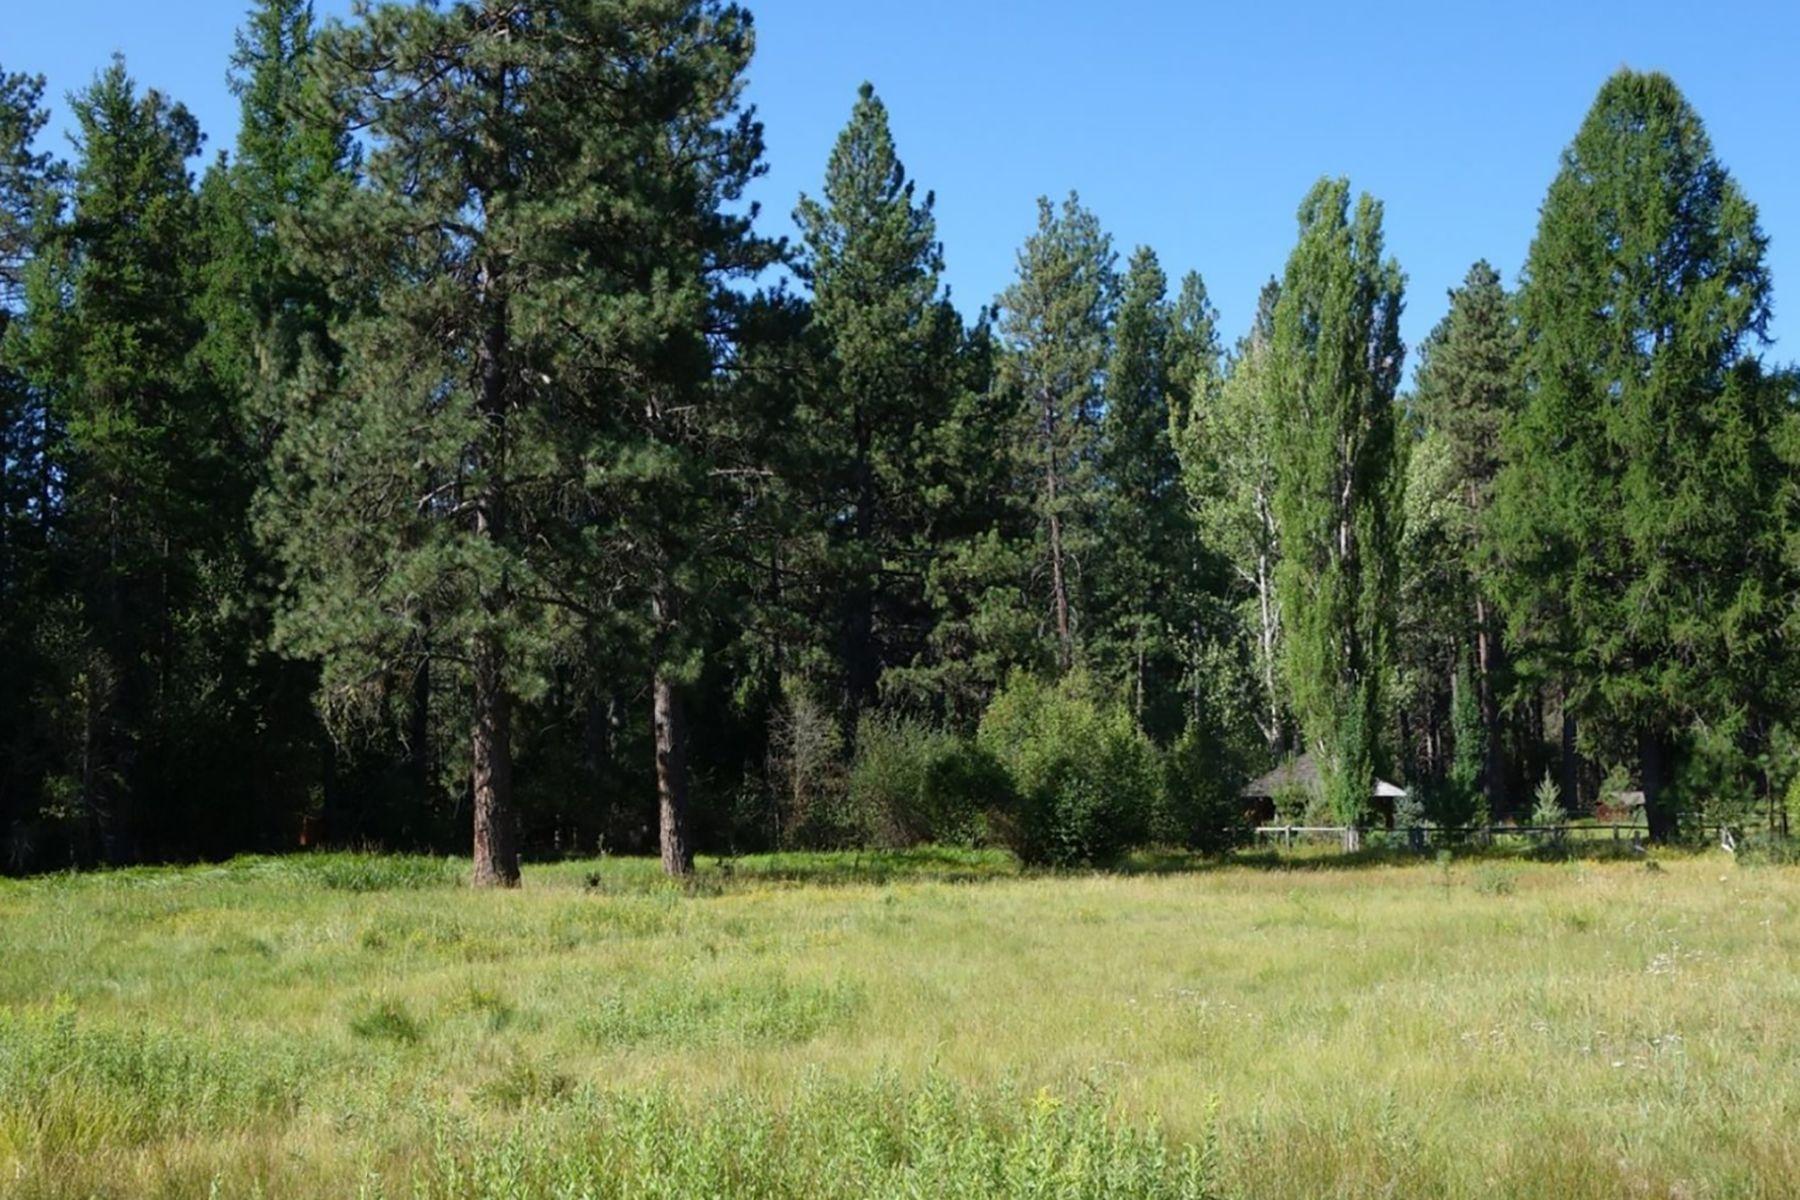 Land for Active at 26237 SW Tamarack Lane Camp Sherman, OR 97730 26237 SW Tamarack Lane Camp Sherman, Oregon 97730 United States